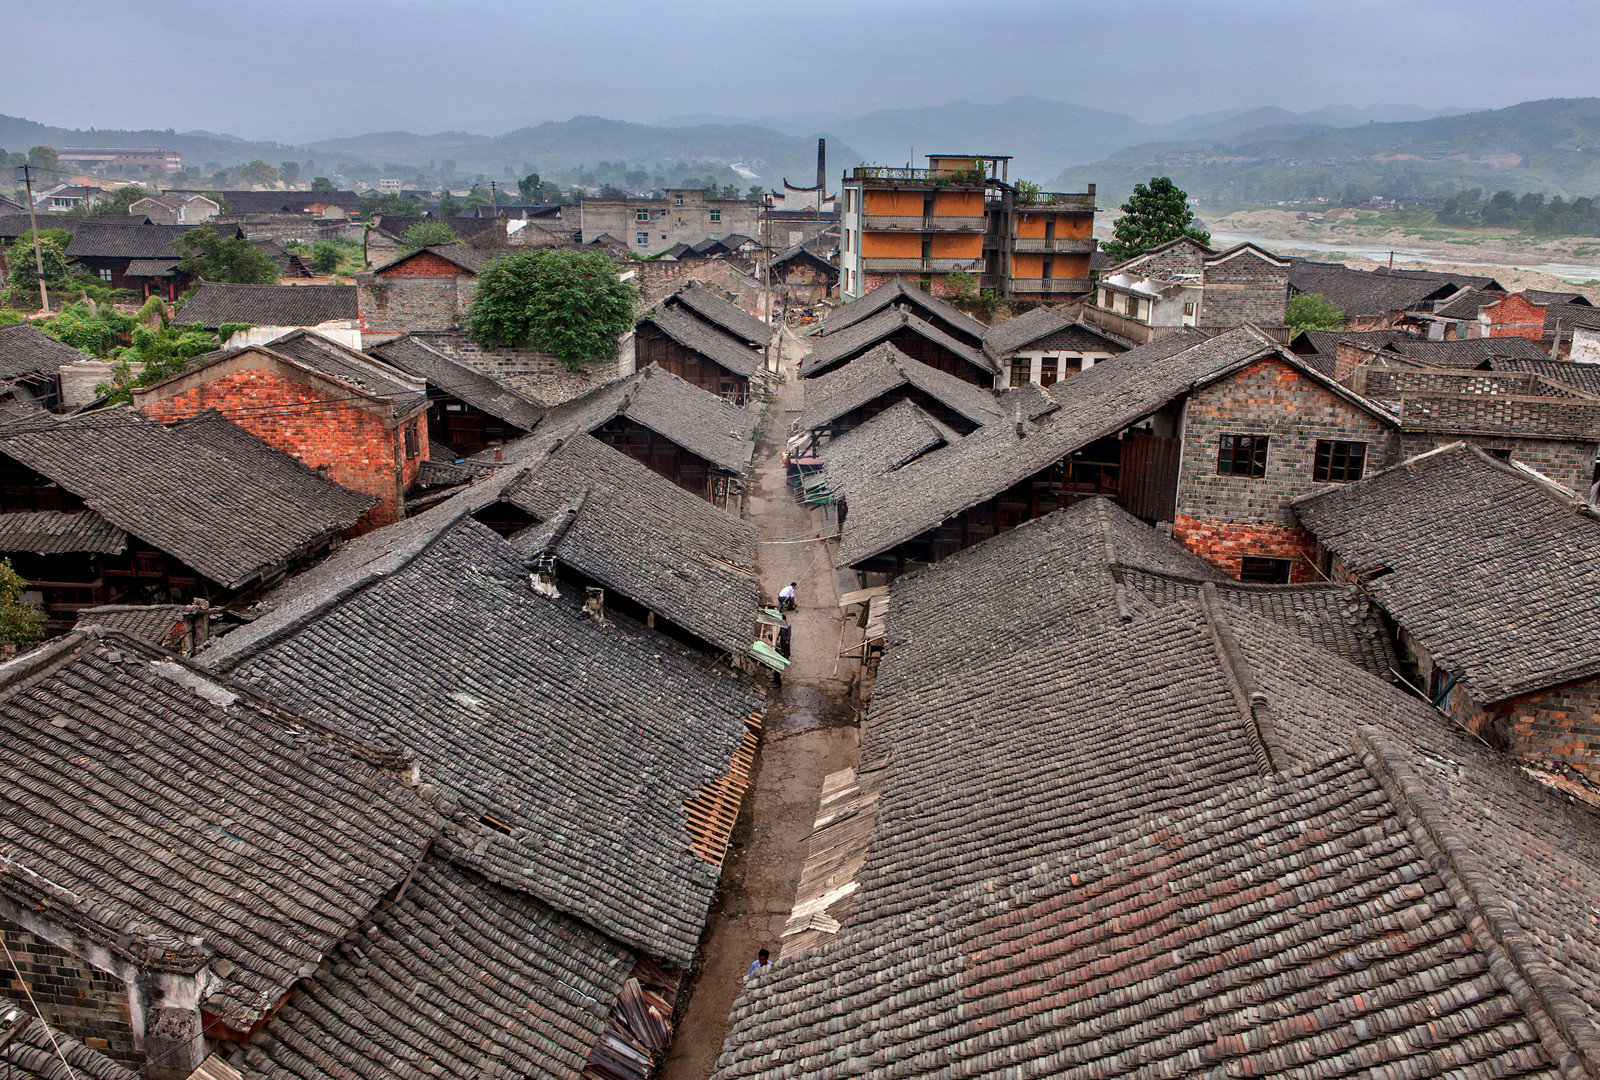 kuang-huimin-lost-dreams-in-tuokou-photography-of-china-1.jpg